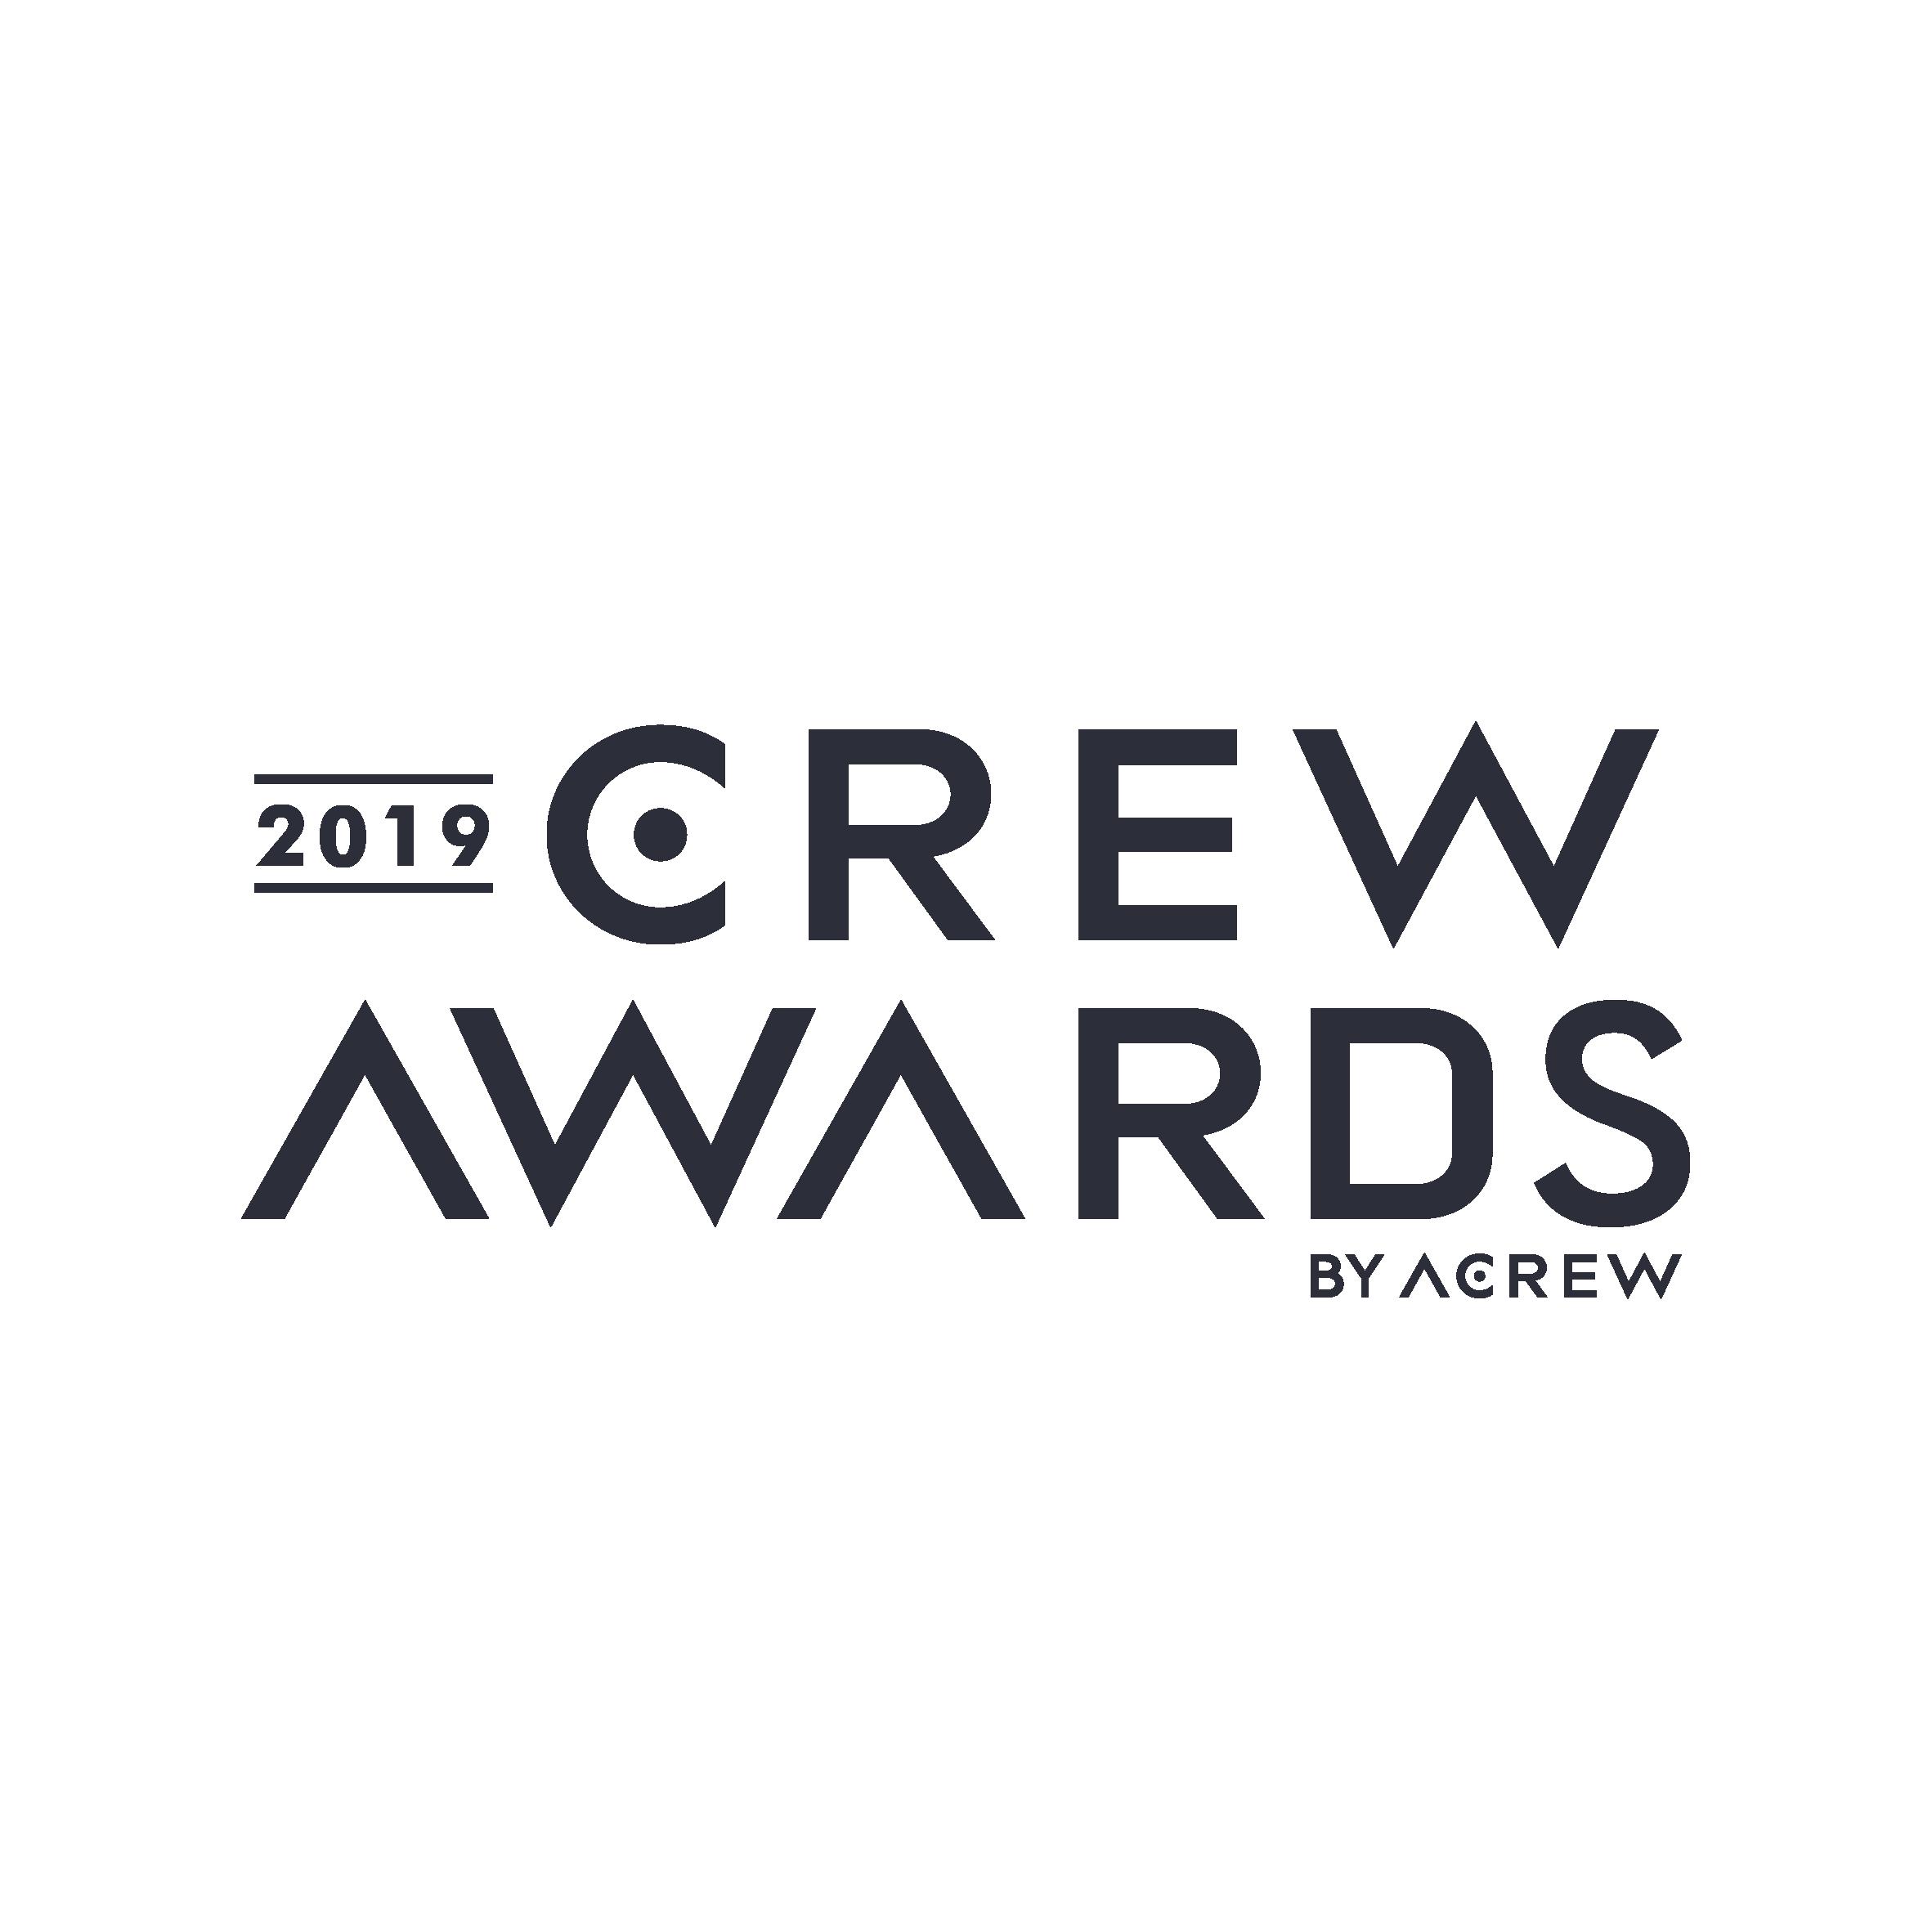 crew awards 2019 banner